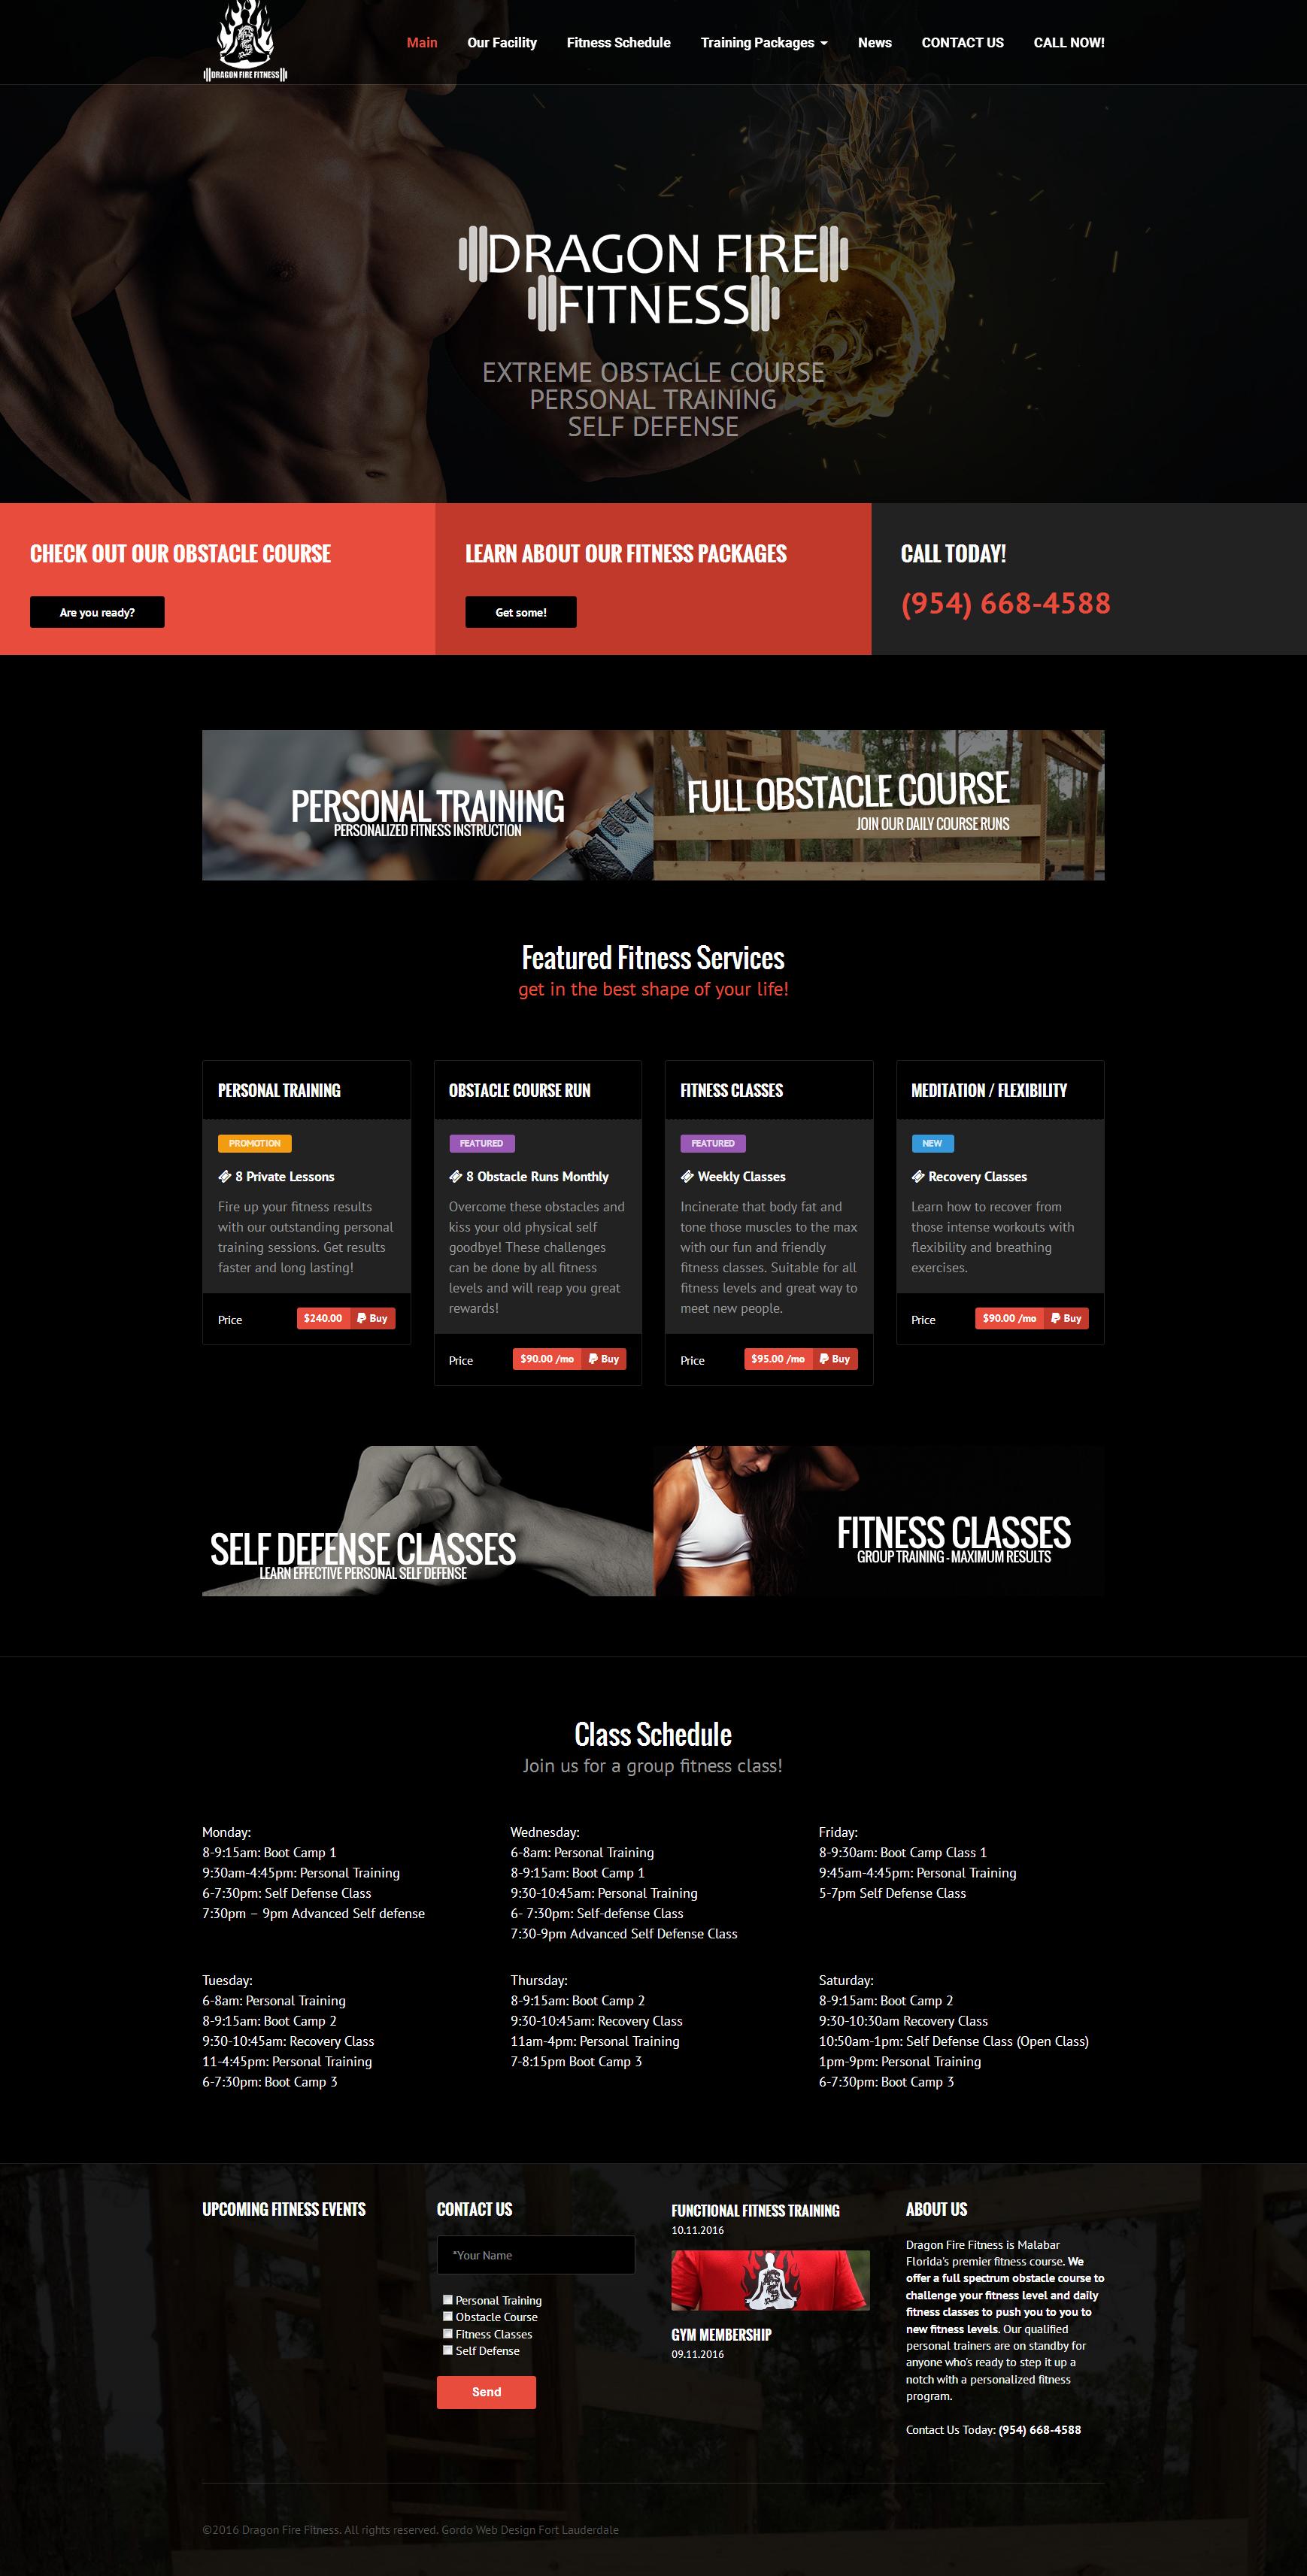 Gordo Web Design image 4